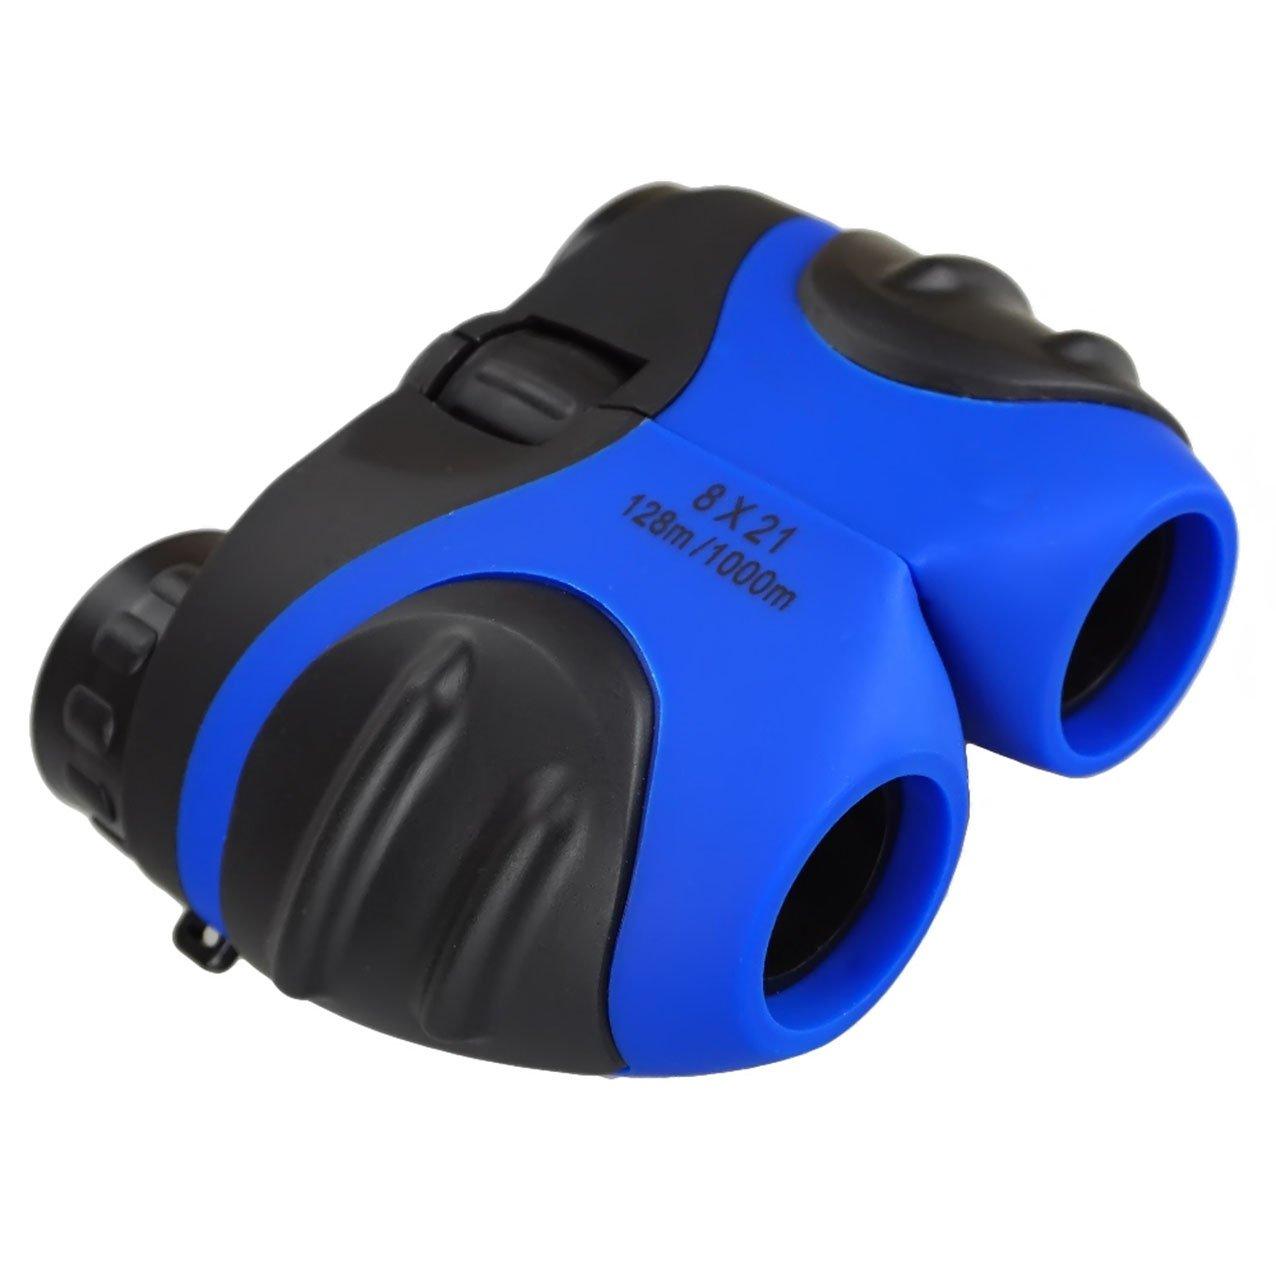 Darli軽量コンパクト双眼鏡for Bird Watching Hunting – Best Gifts B07CKT786H ブルー ブルー